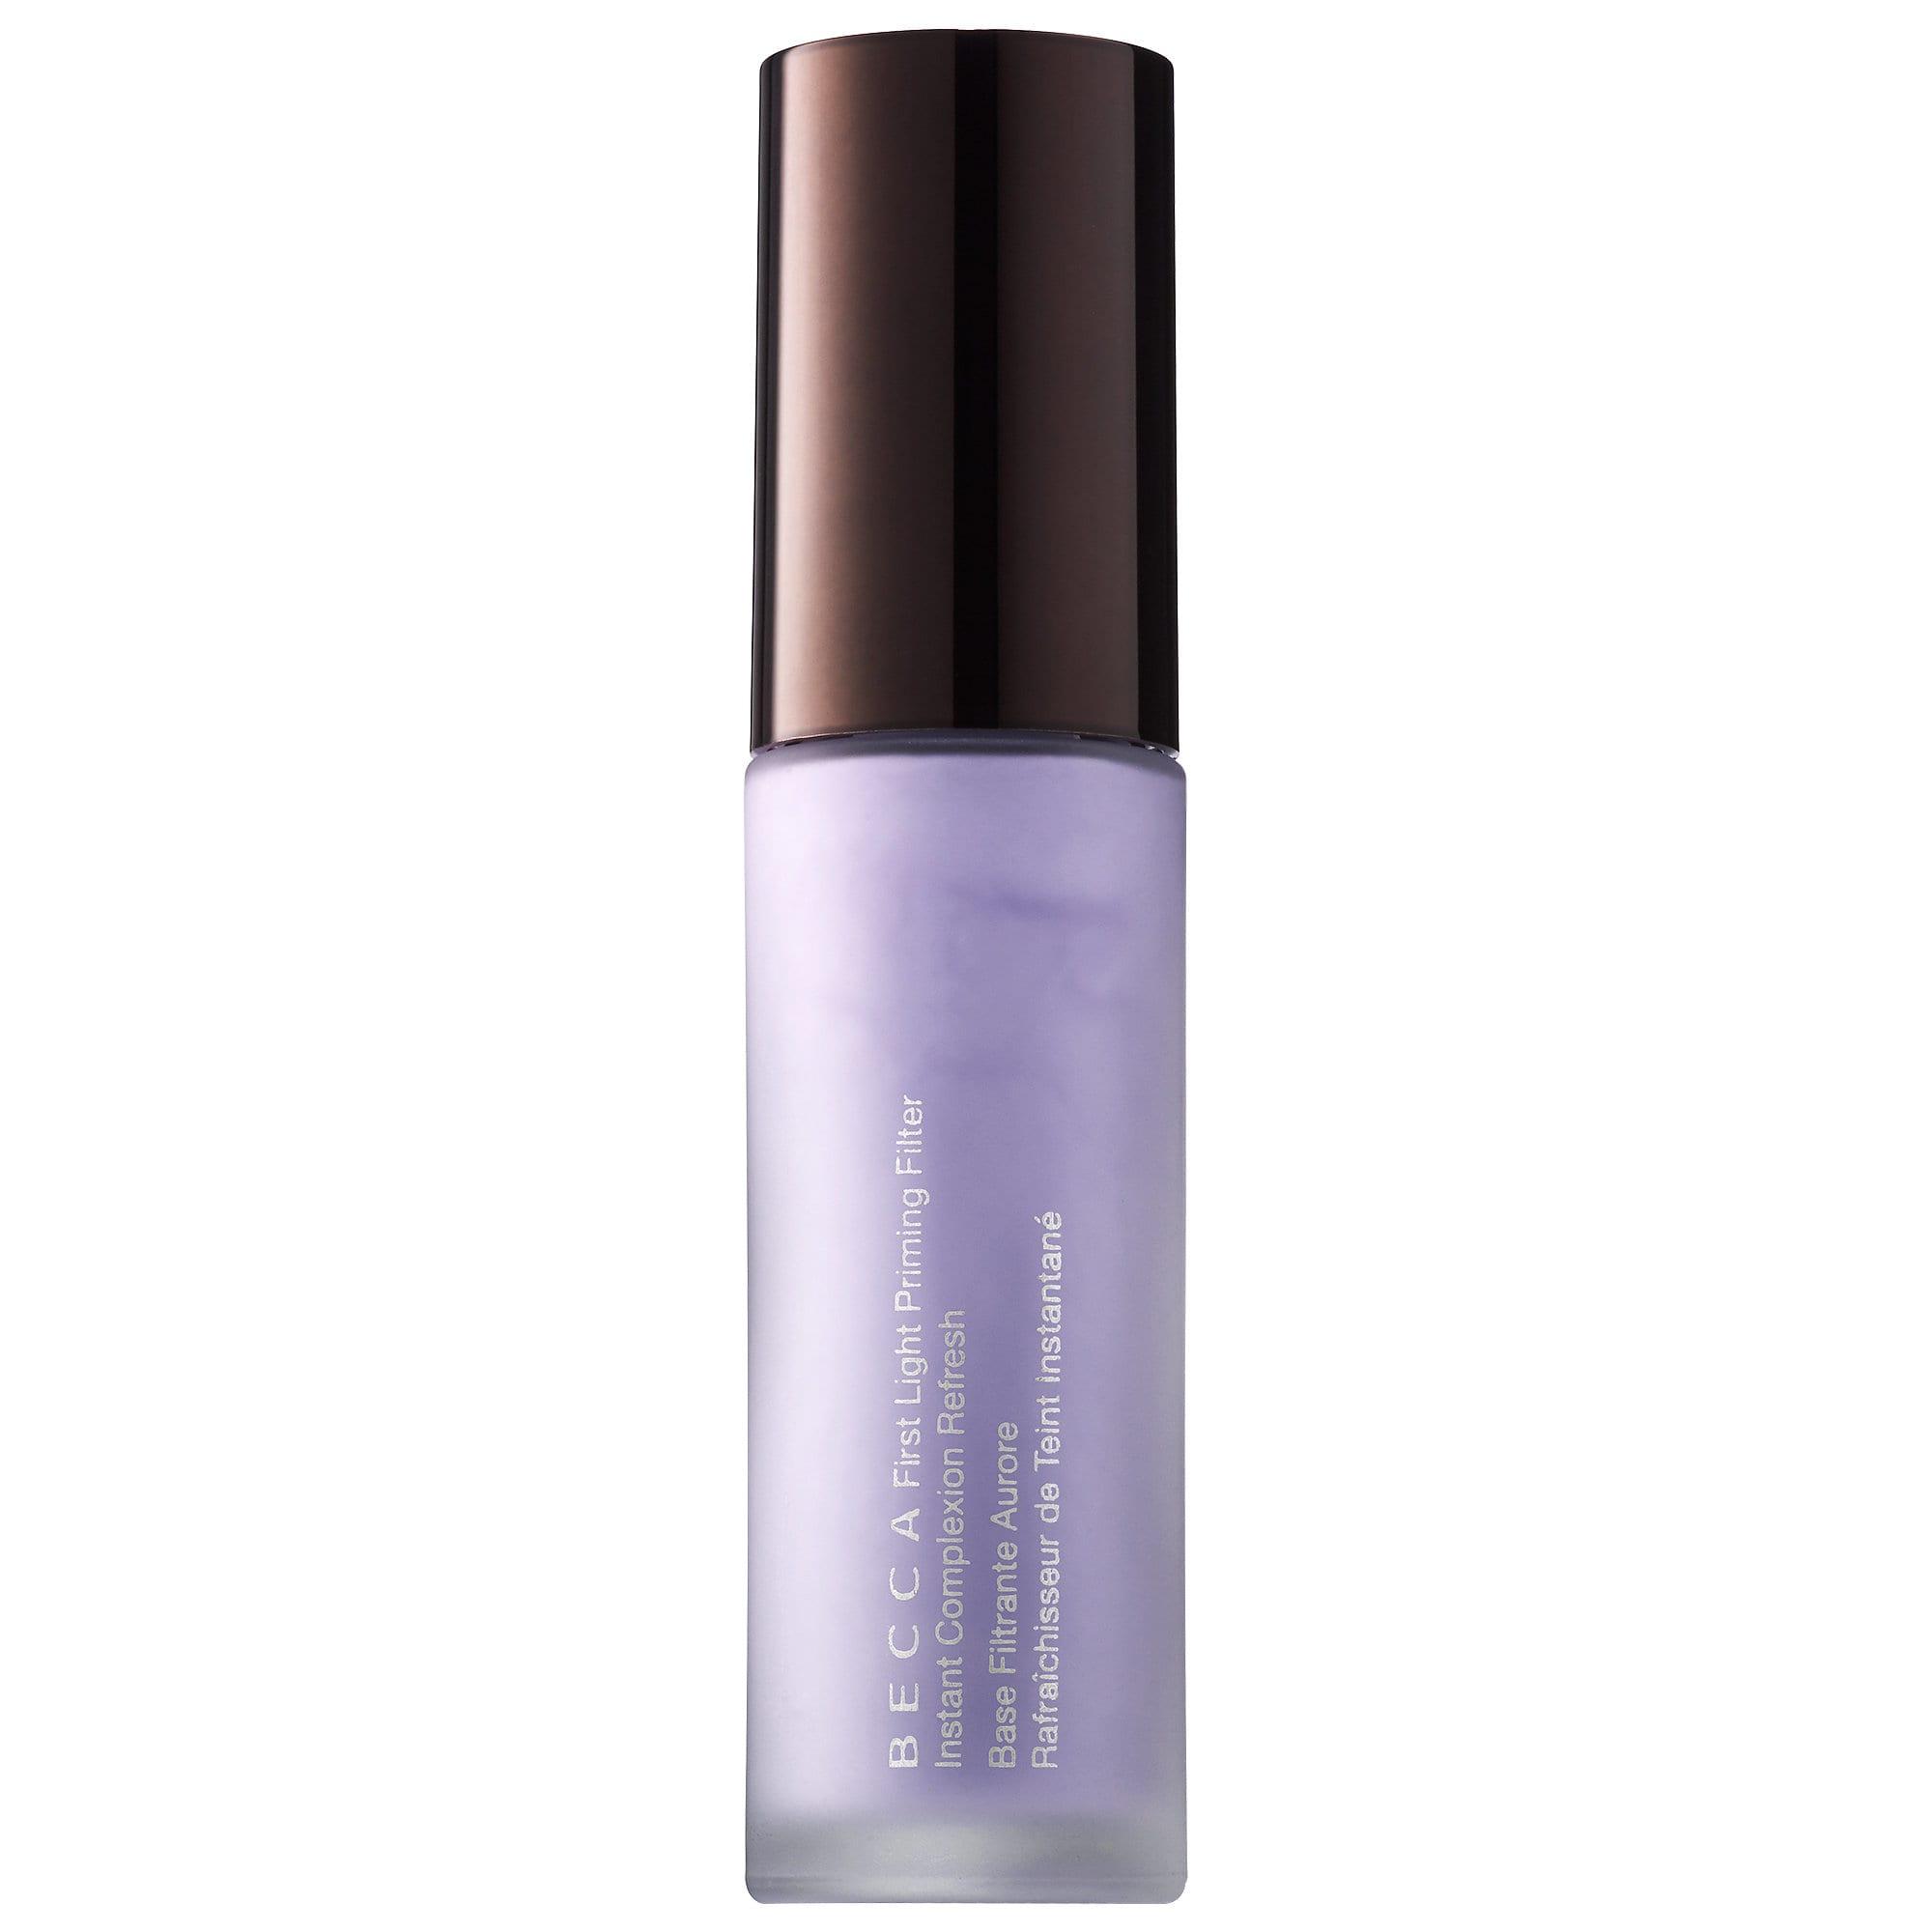 First Light Priming Filter Face Primer Primer For Dry Skin